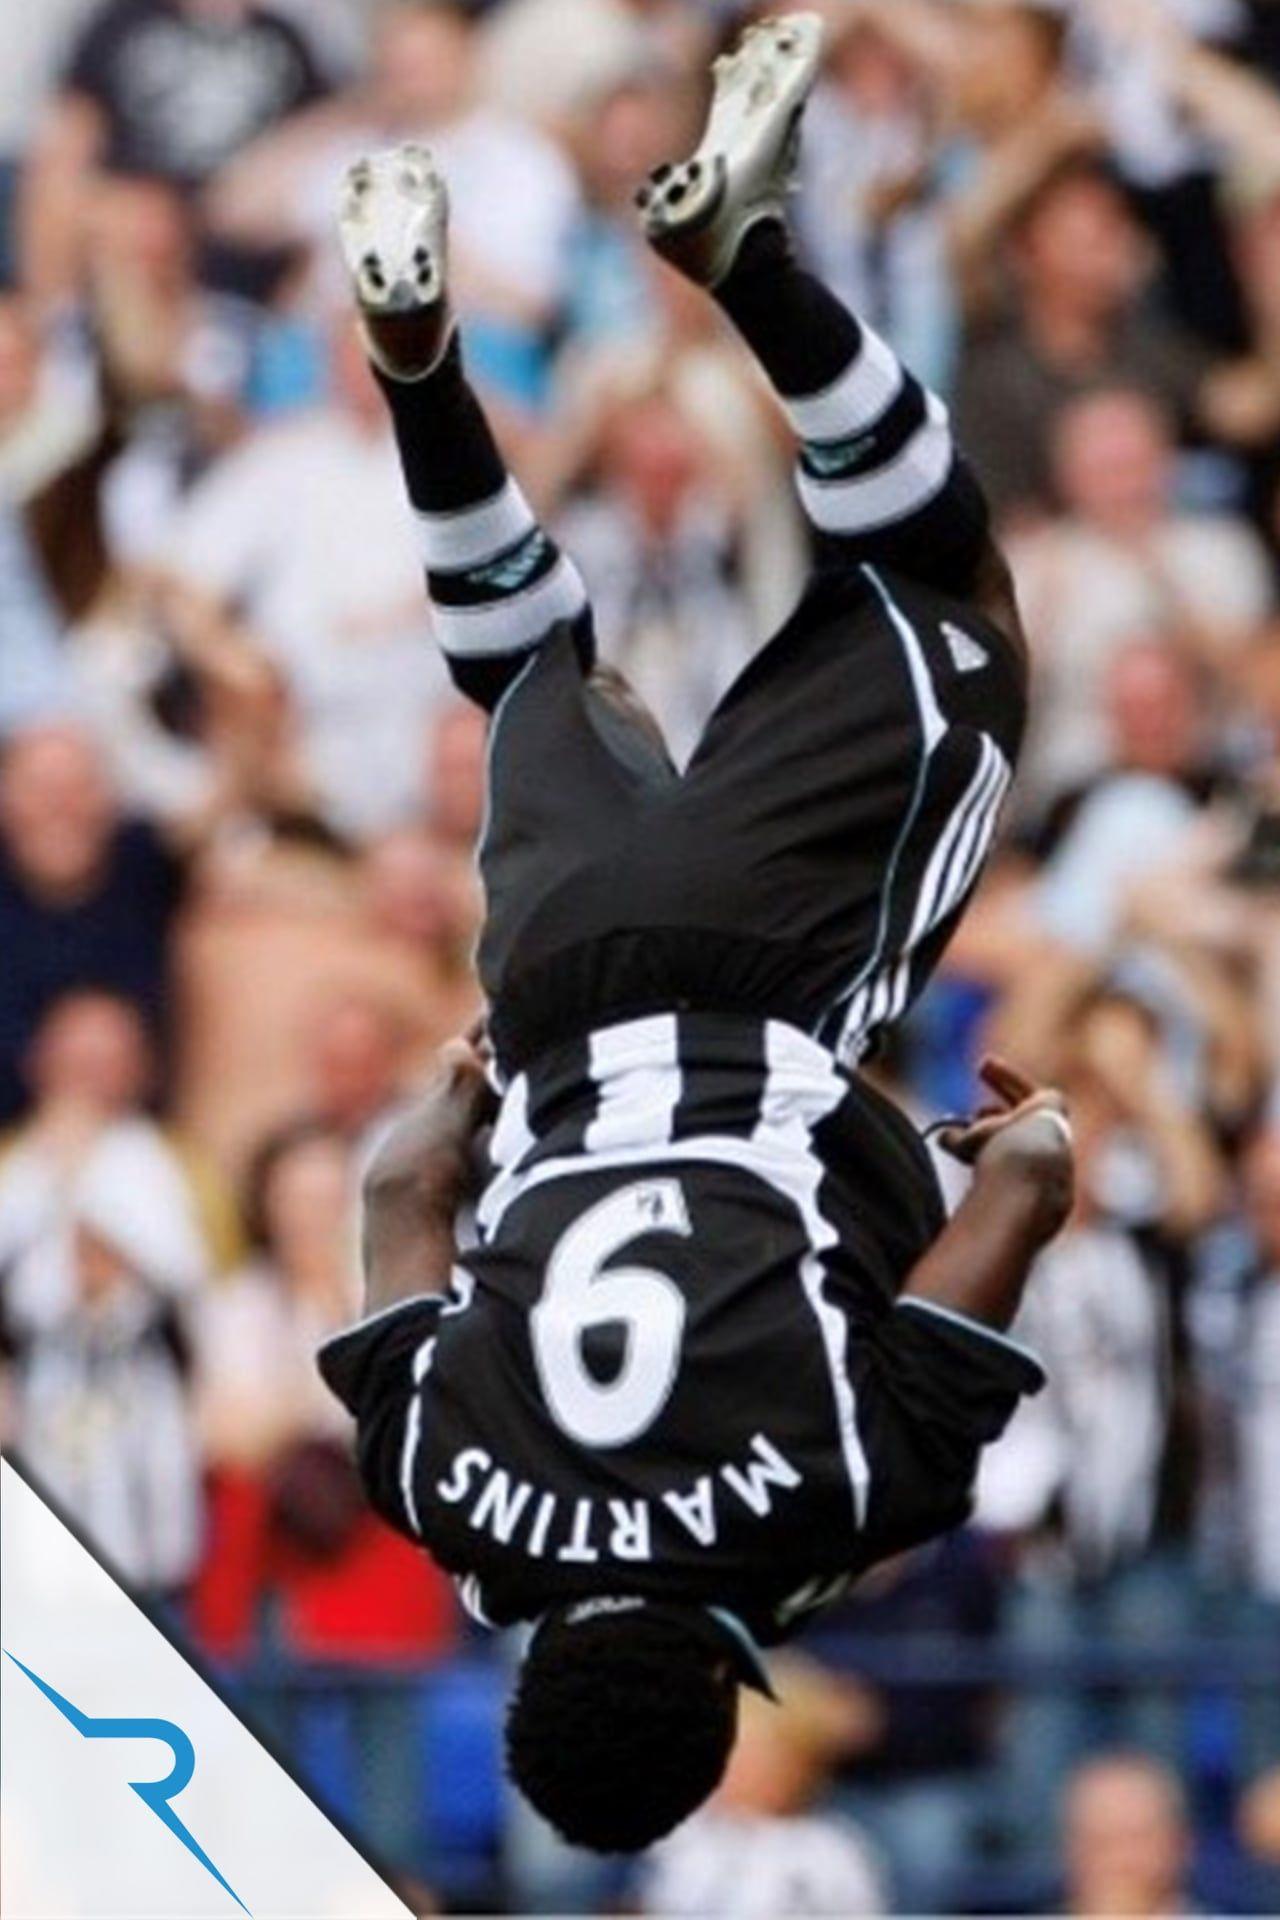 Obafemi Martins transferring to Wuhan Zall